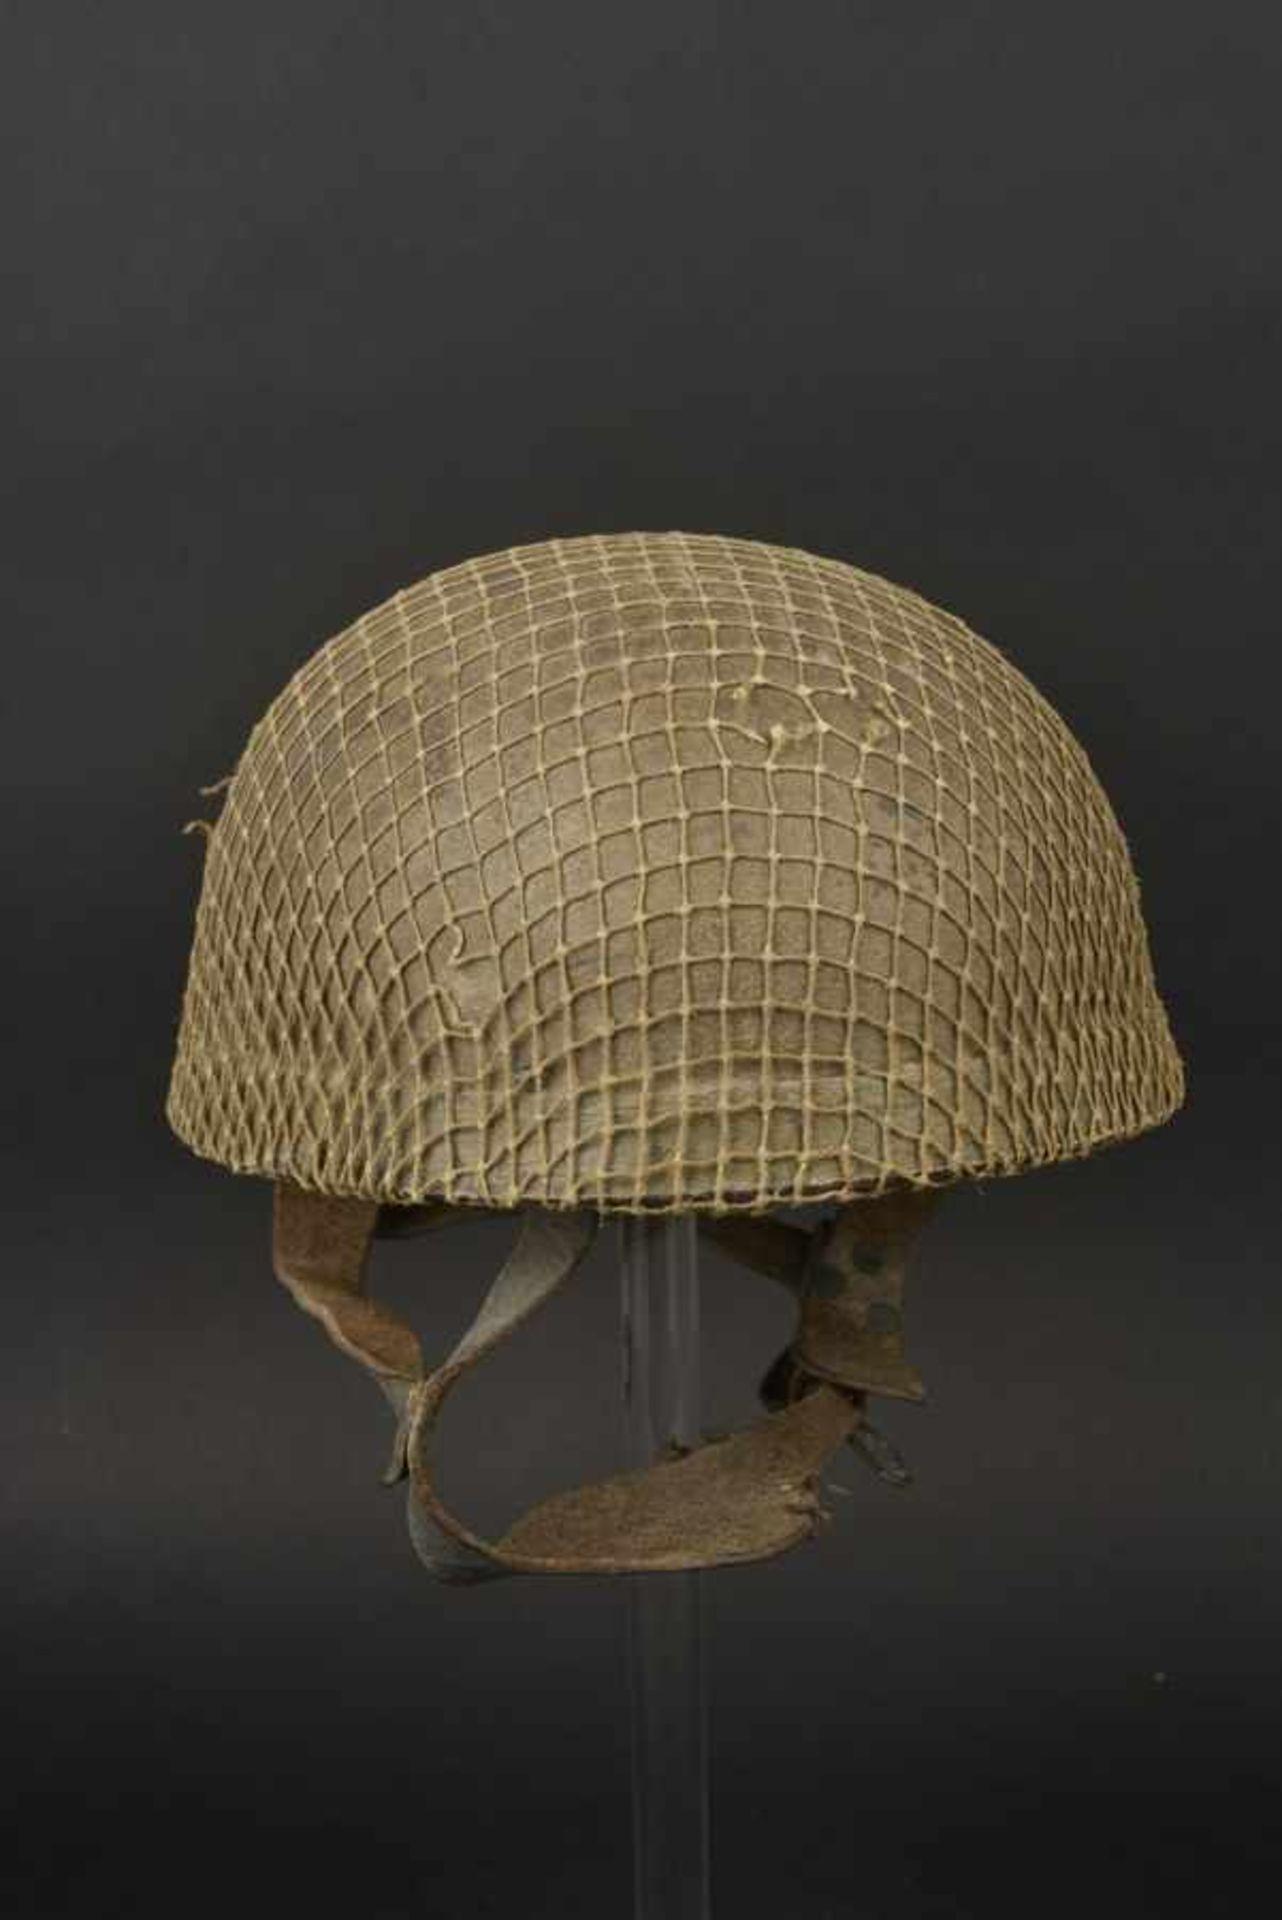 Casque de parachutiste britannique. British paratrooper helmet Coque du premier type. Peinture d'